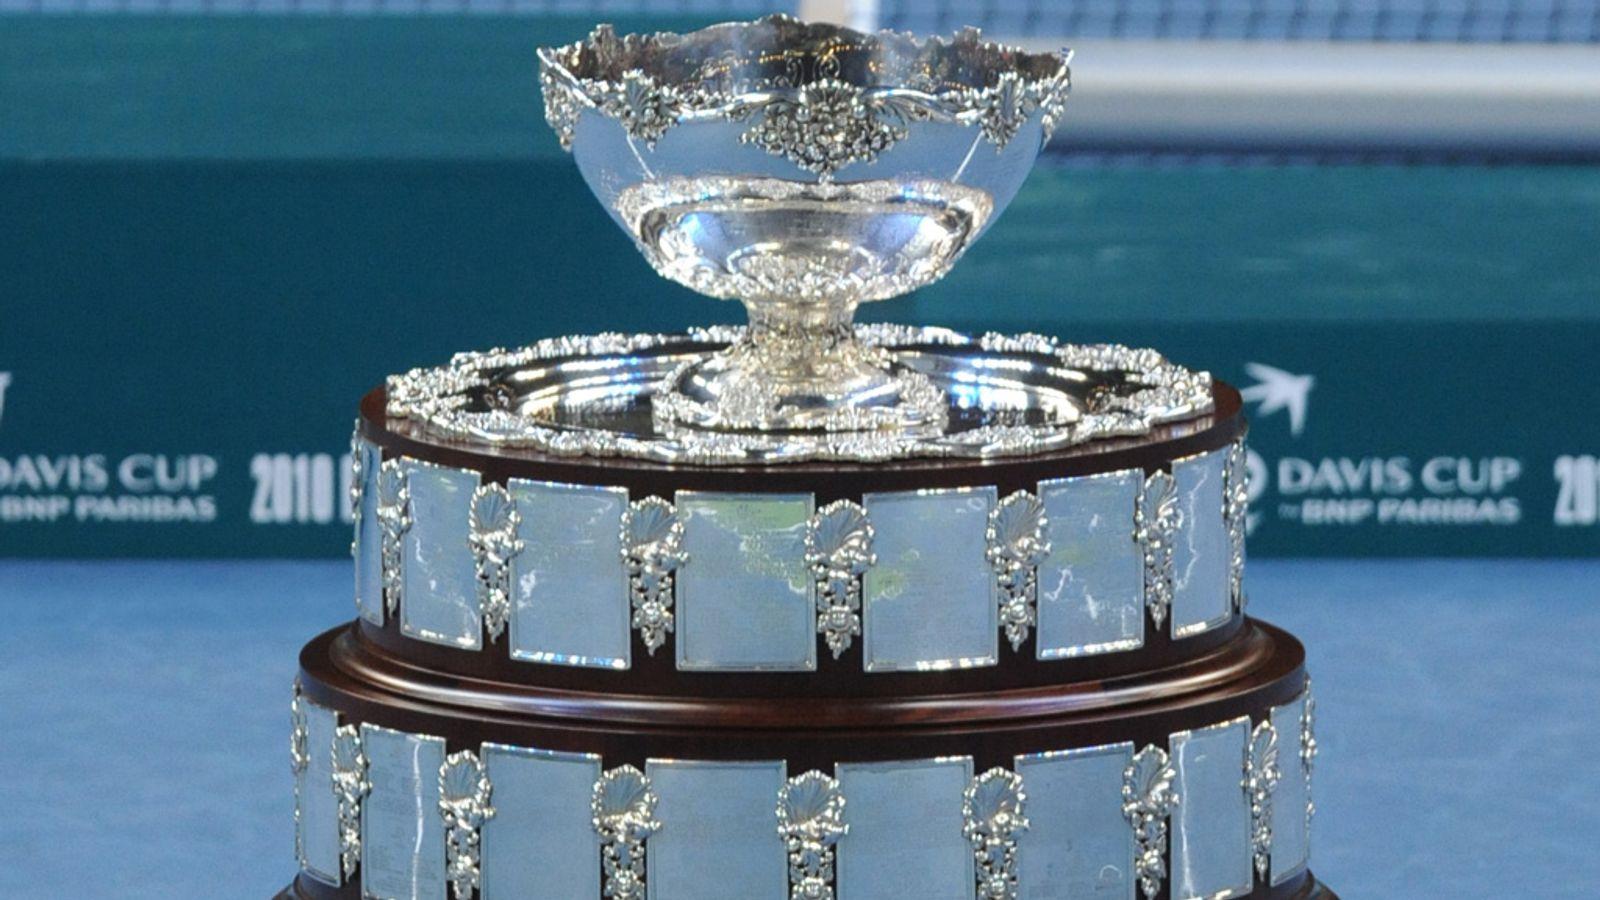 davis cup - HD1600×900